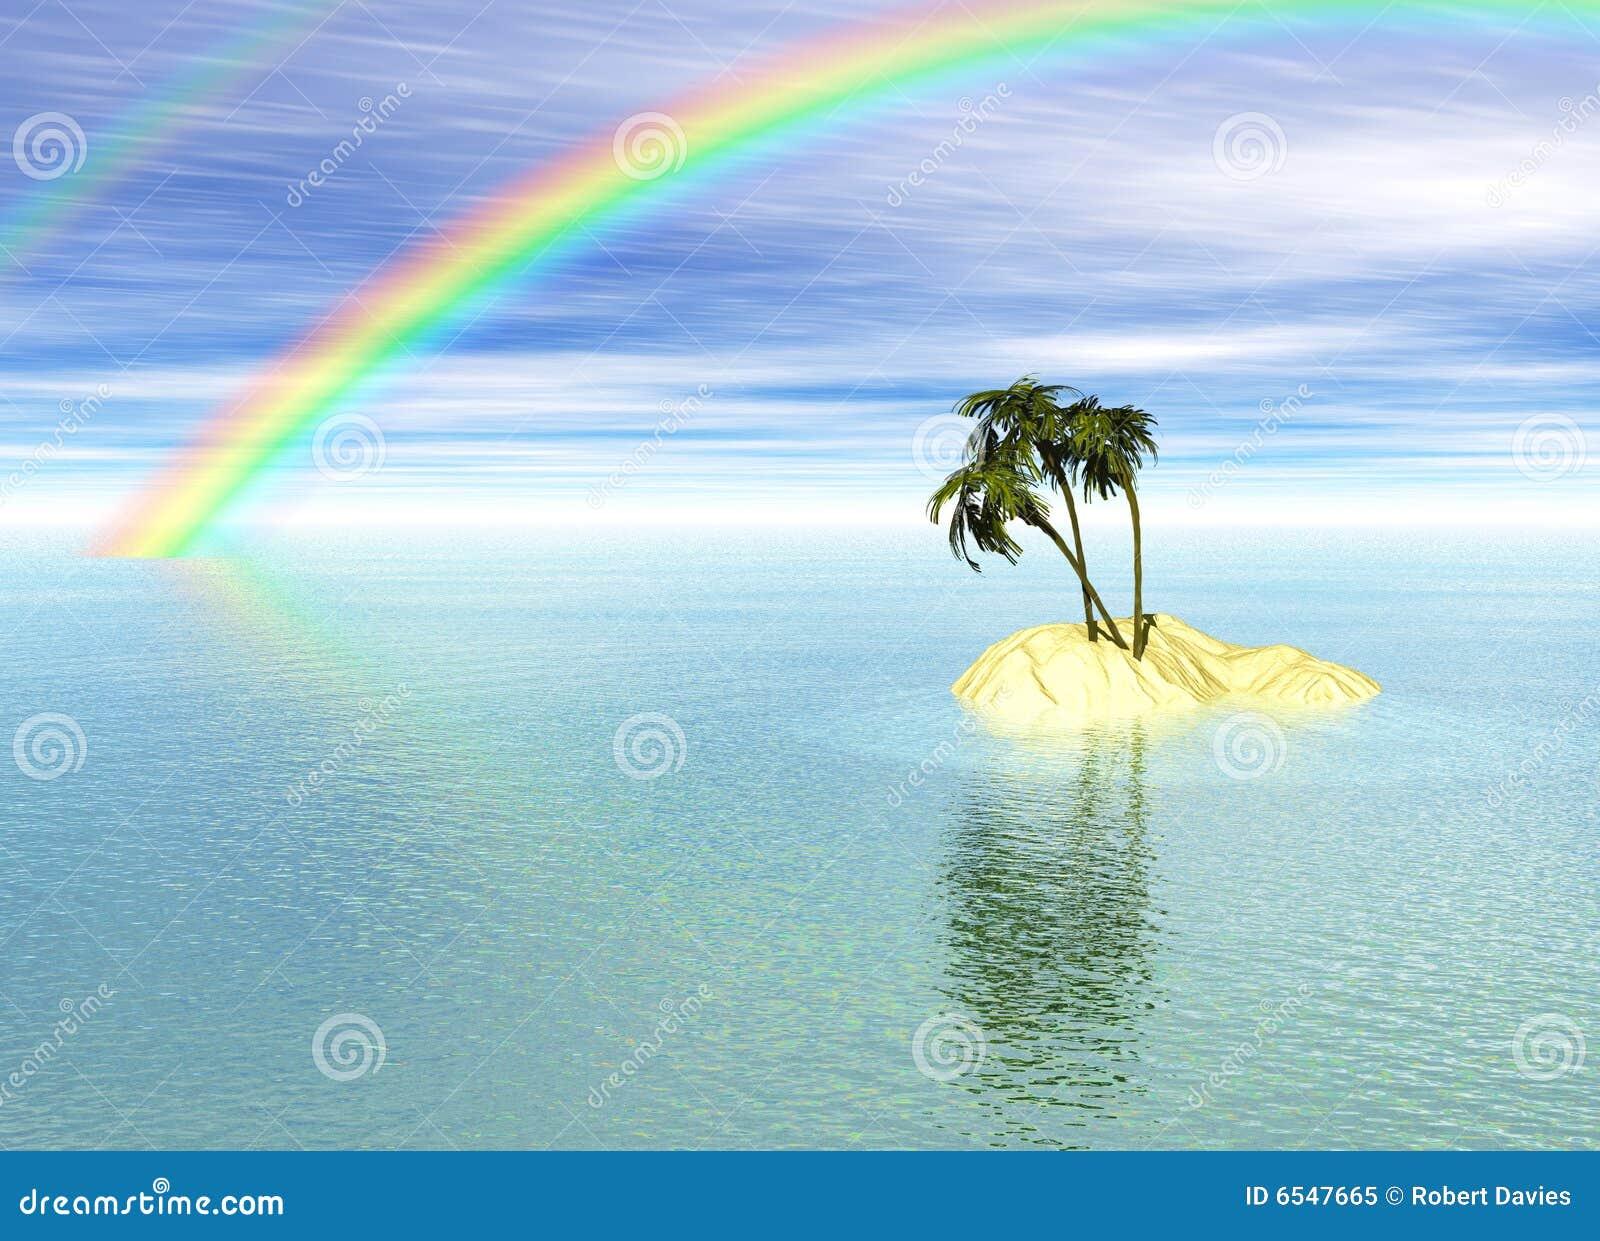 romantic desert island with palm tree and rainbow stock illustration illustration of render. Black Bedroom Furniture Sets. Home Design Ideas